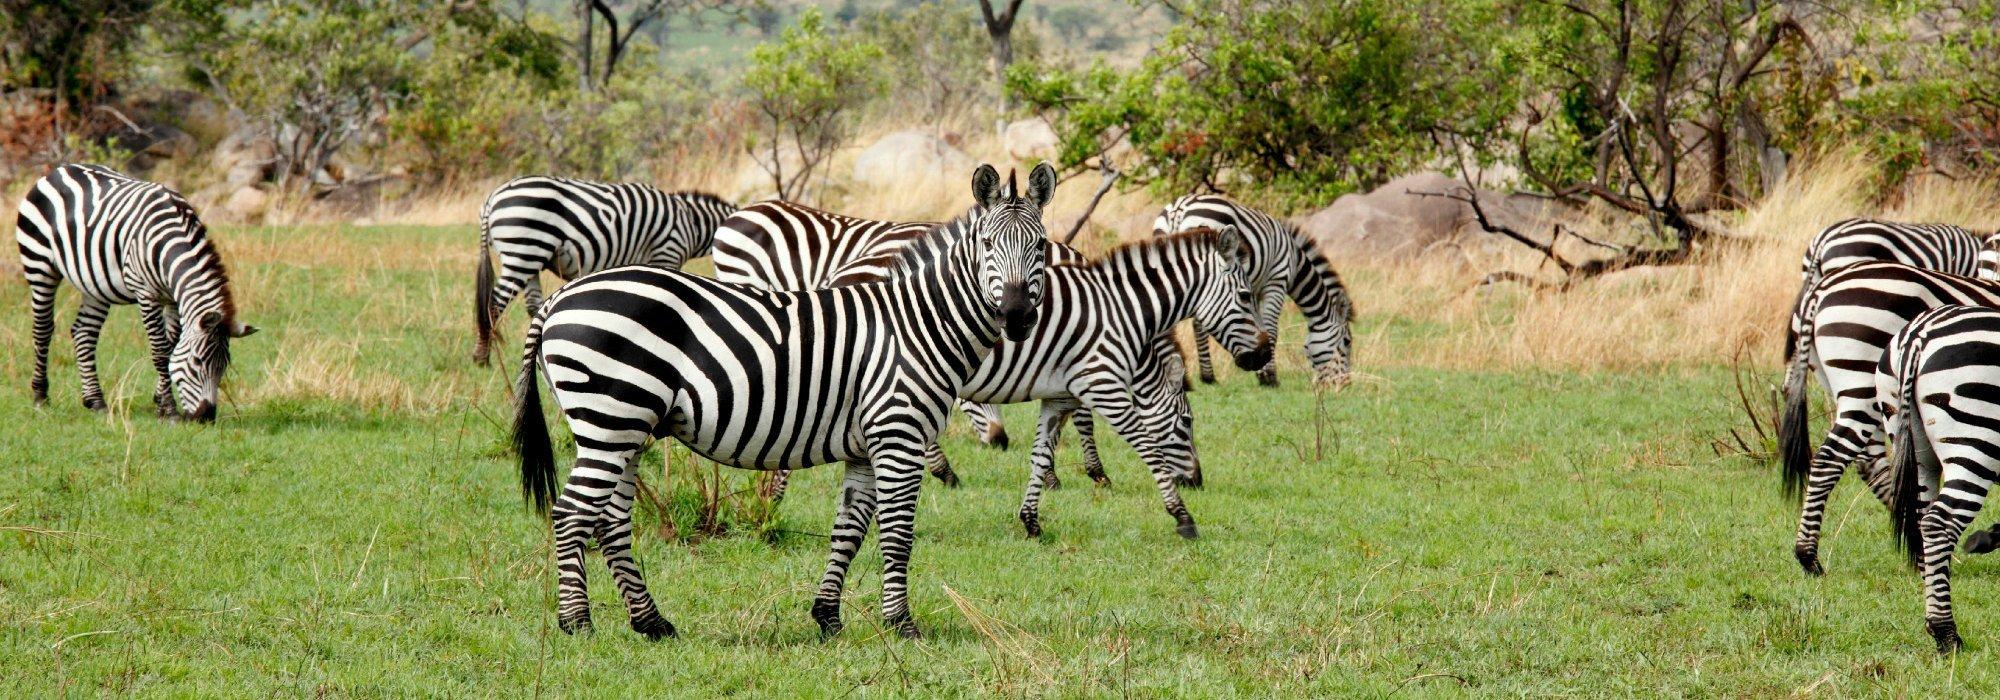 Serengeti Zebras as seen on safari